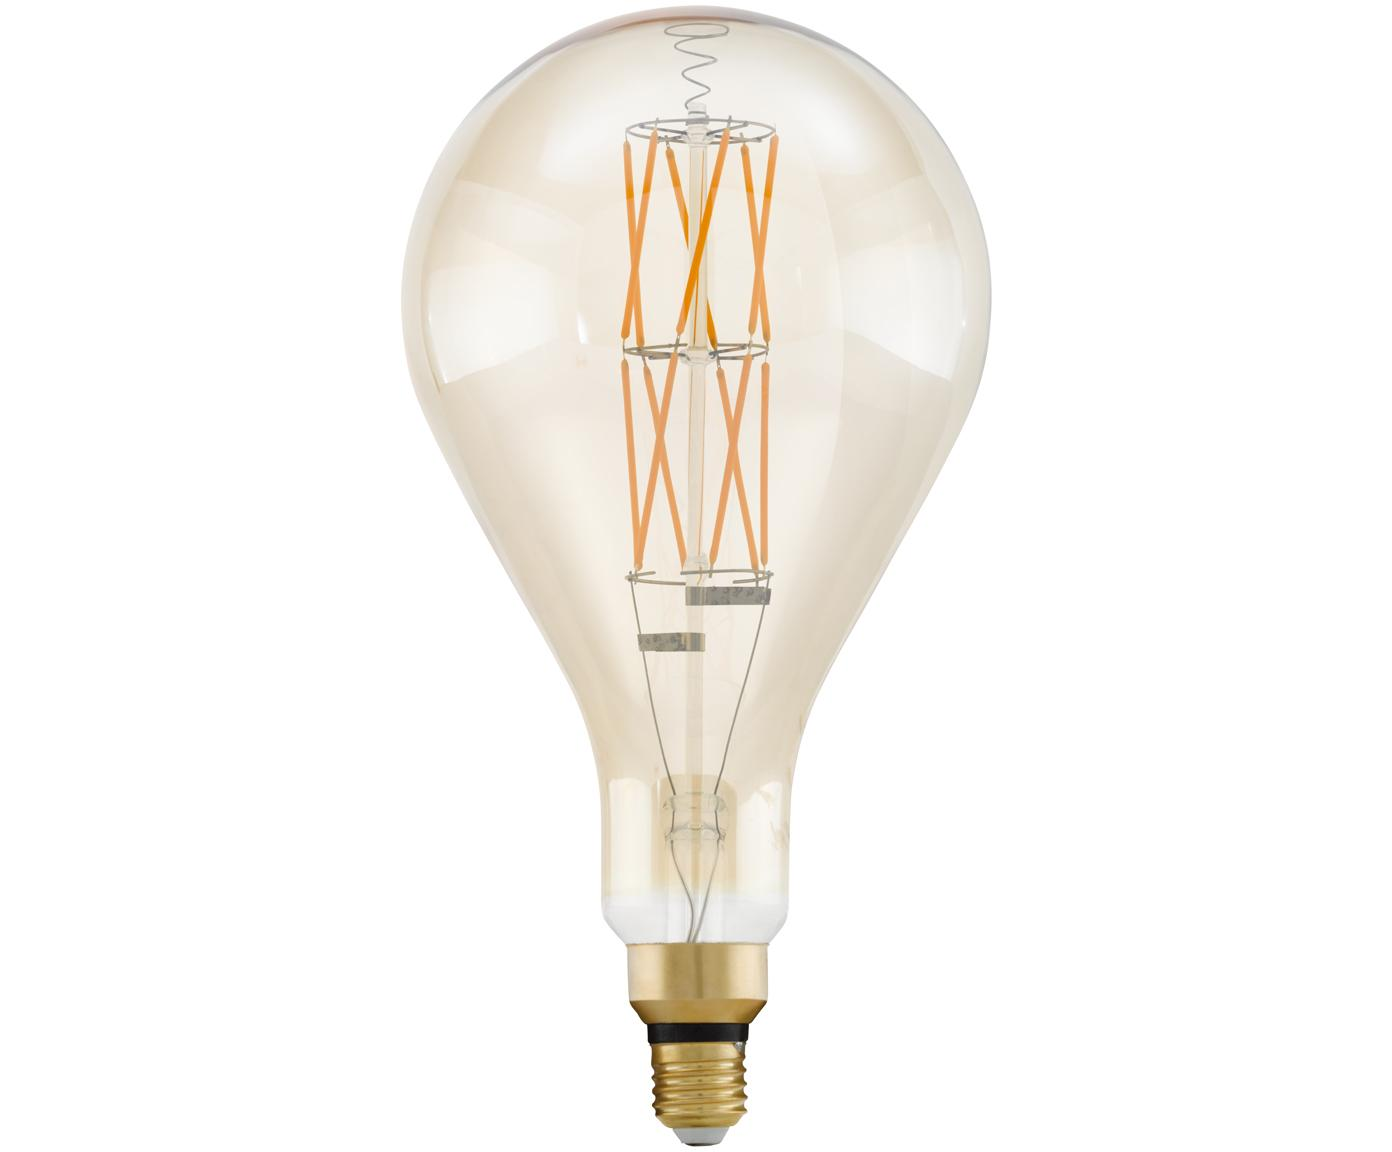 XL LED lamp Crisscross (E27 / 8W), Peertje: glas, Fitting: aluminium, Transparant, amberkleurig, Ø 16 x H 30 cm